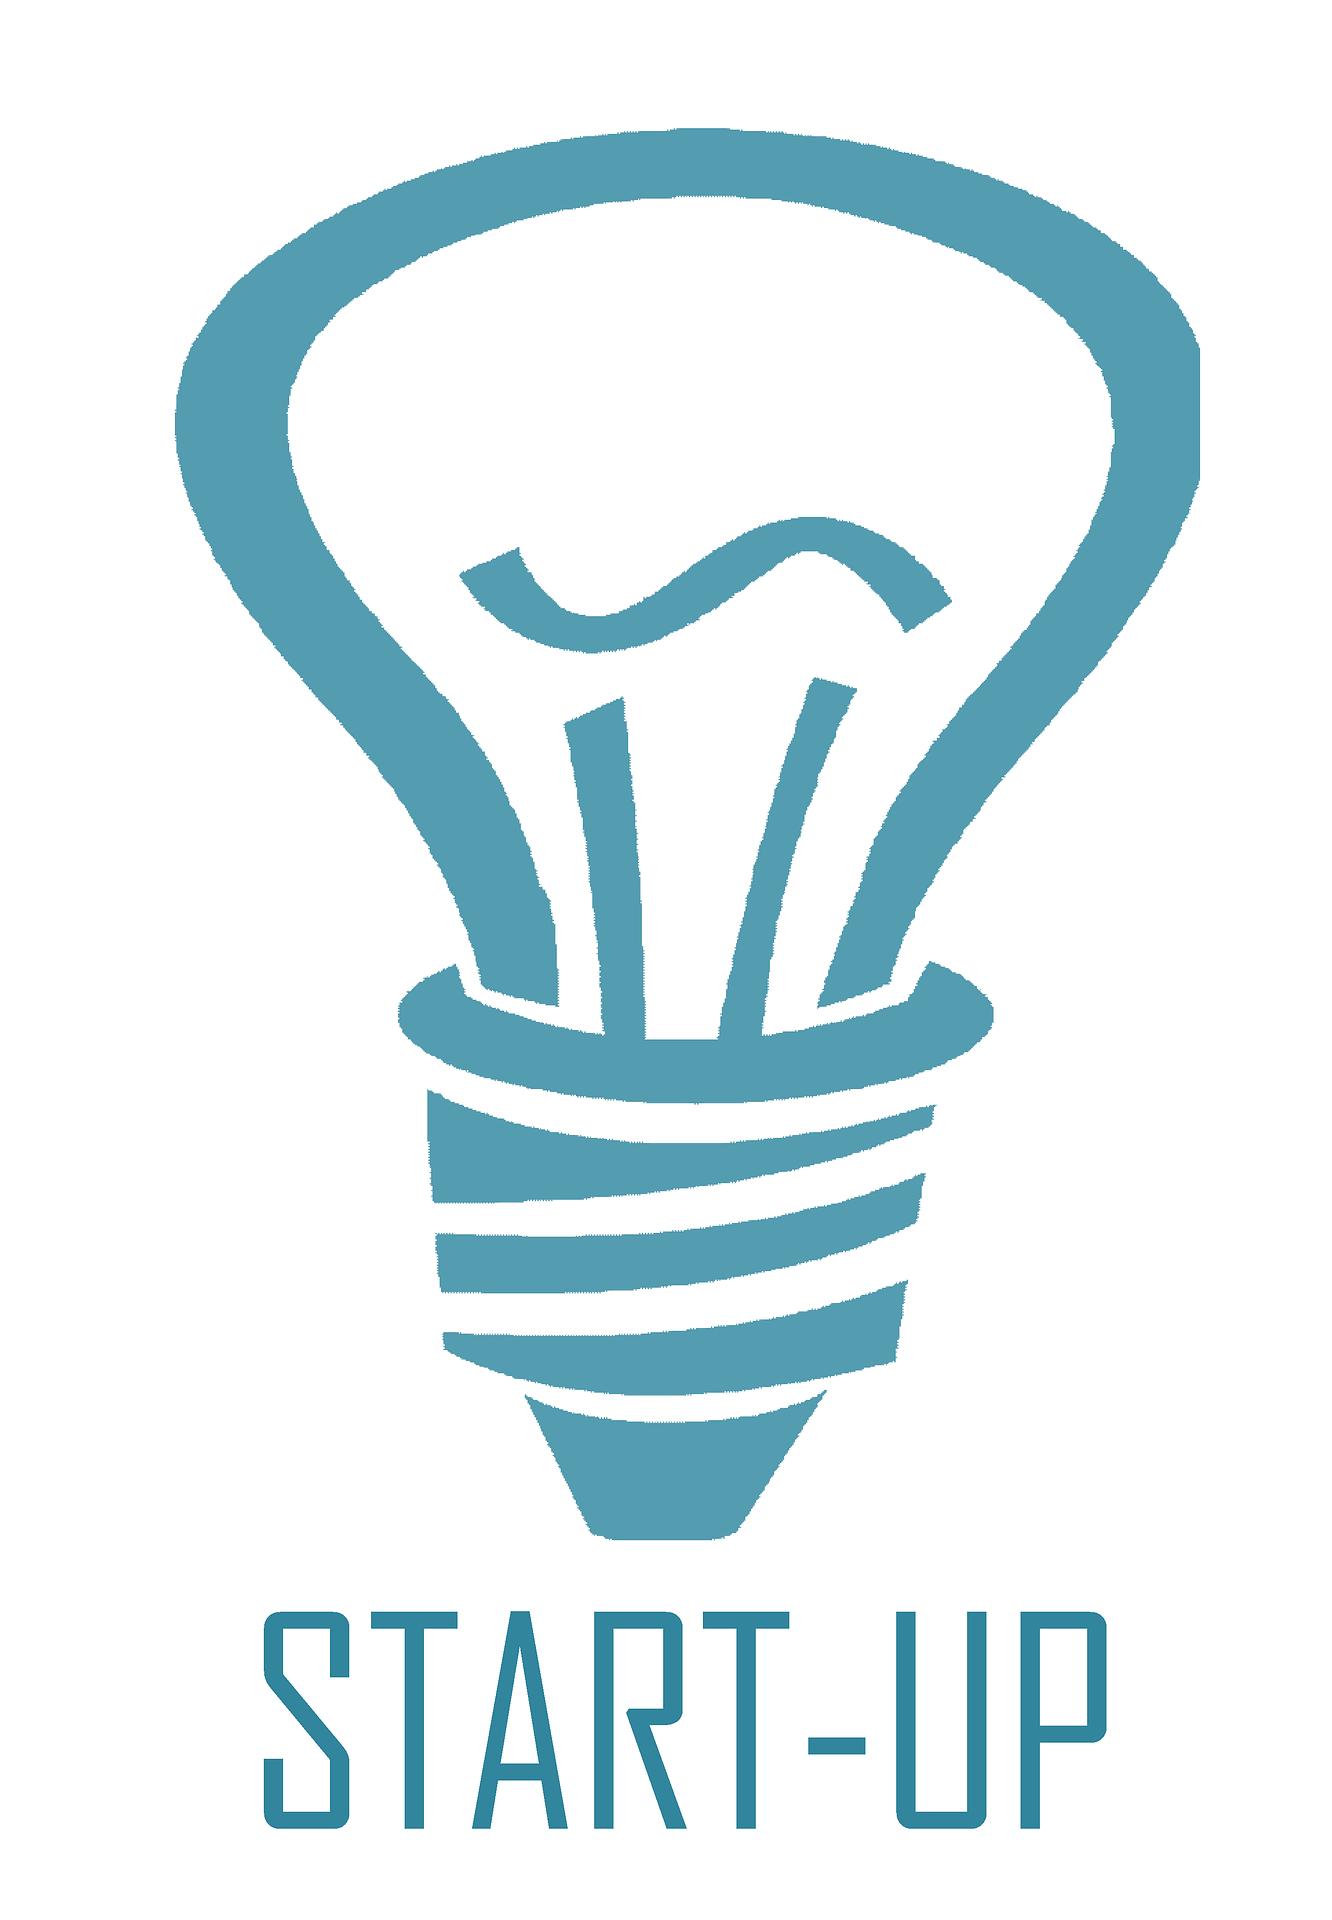 startup-1018548_1920